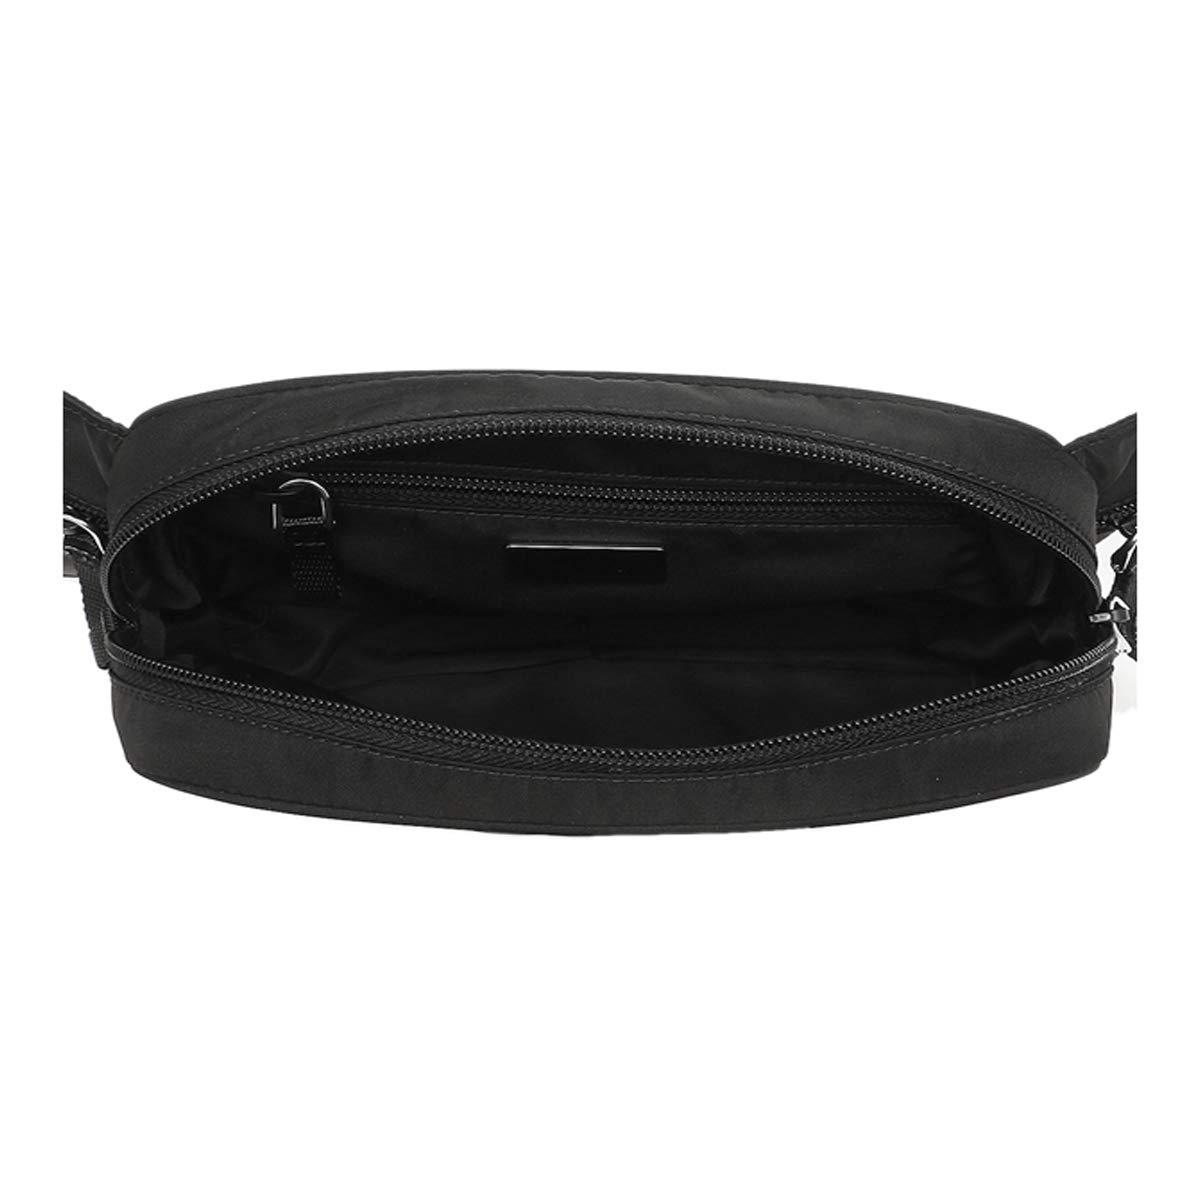 f4f3371974a8 Prada Unisex Black Tessuto Montagn Fanny Pack 2VL001  Amazon.ca  Luggage    Bags